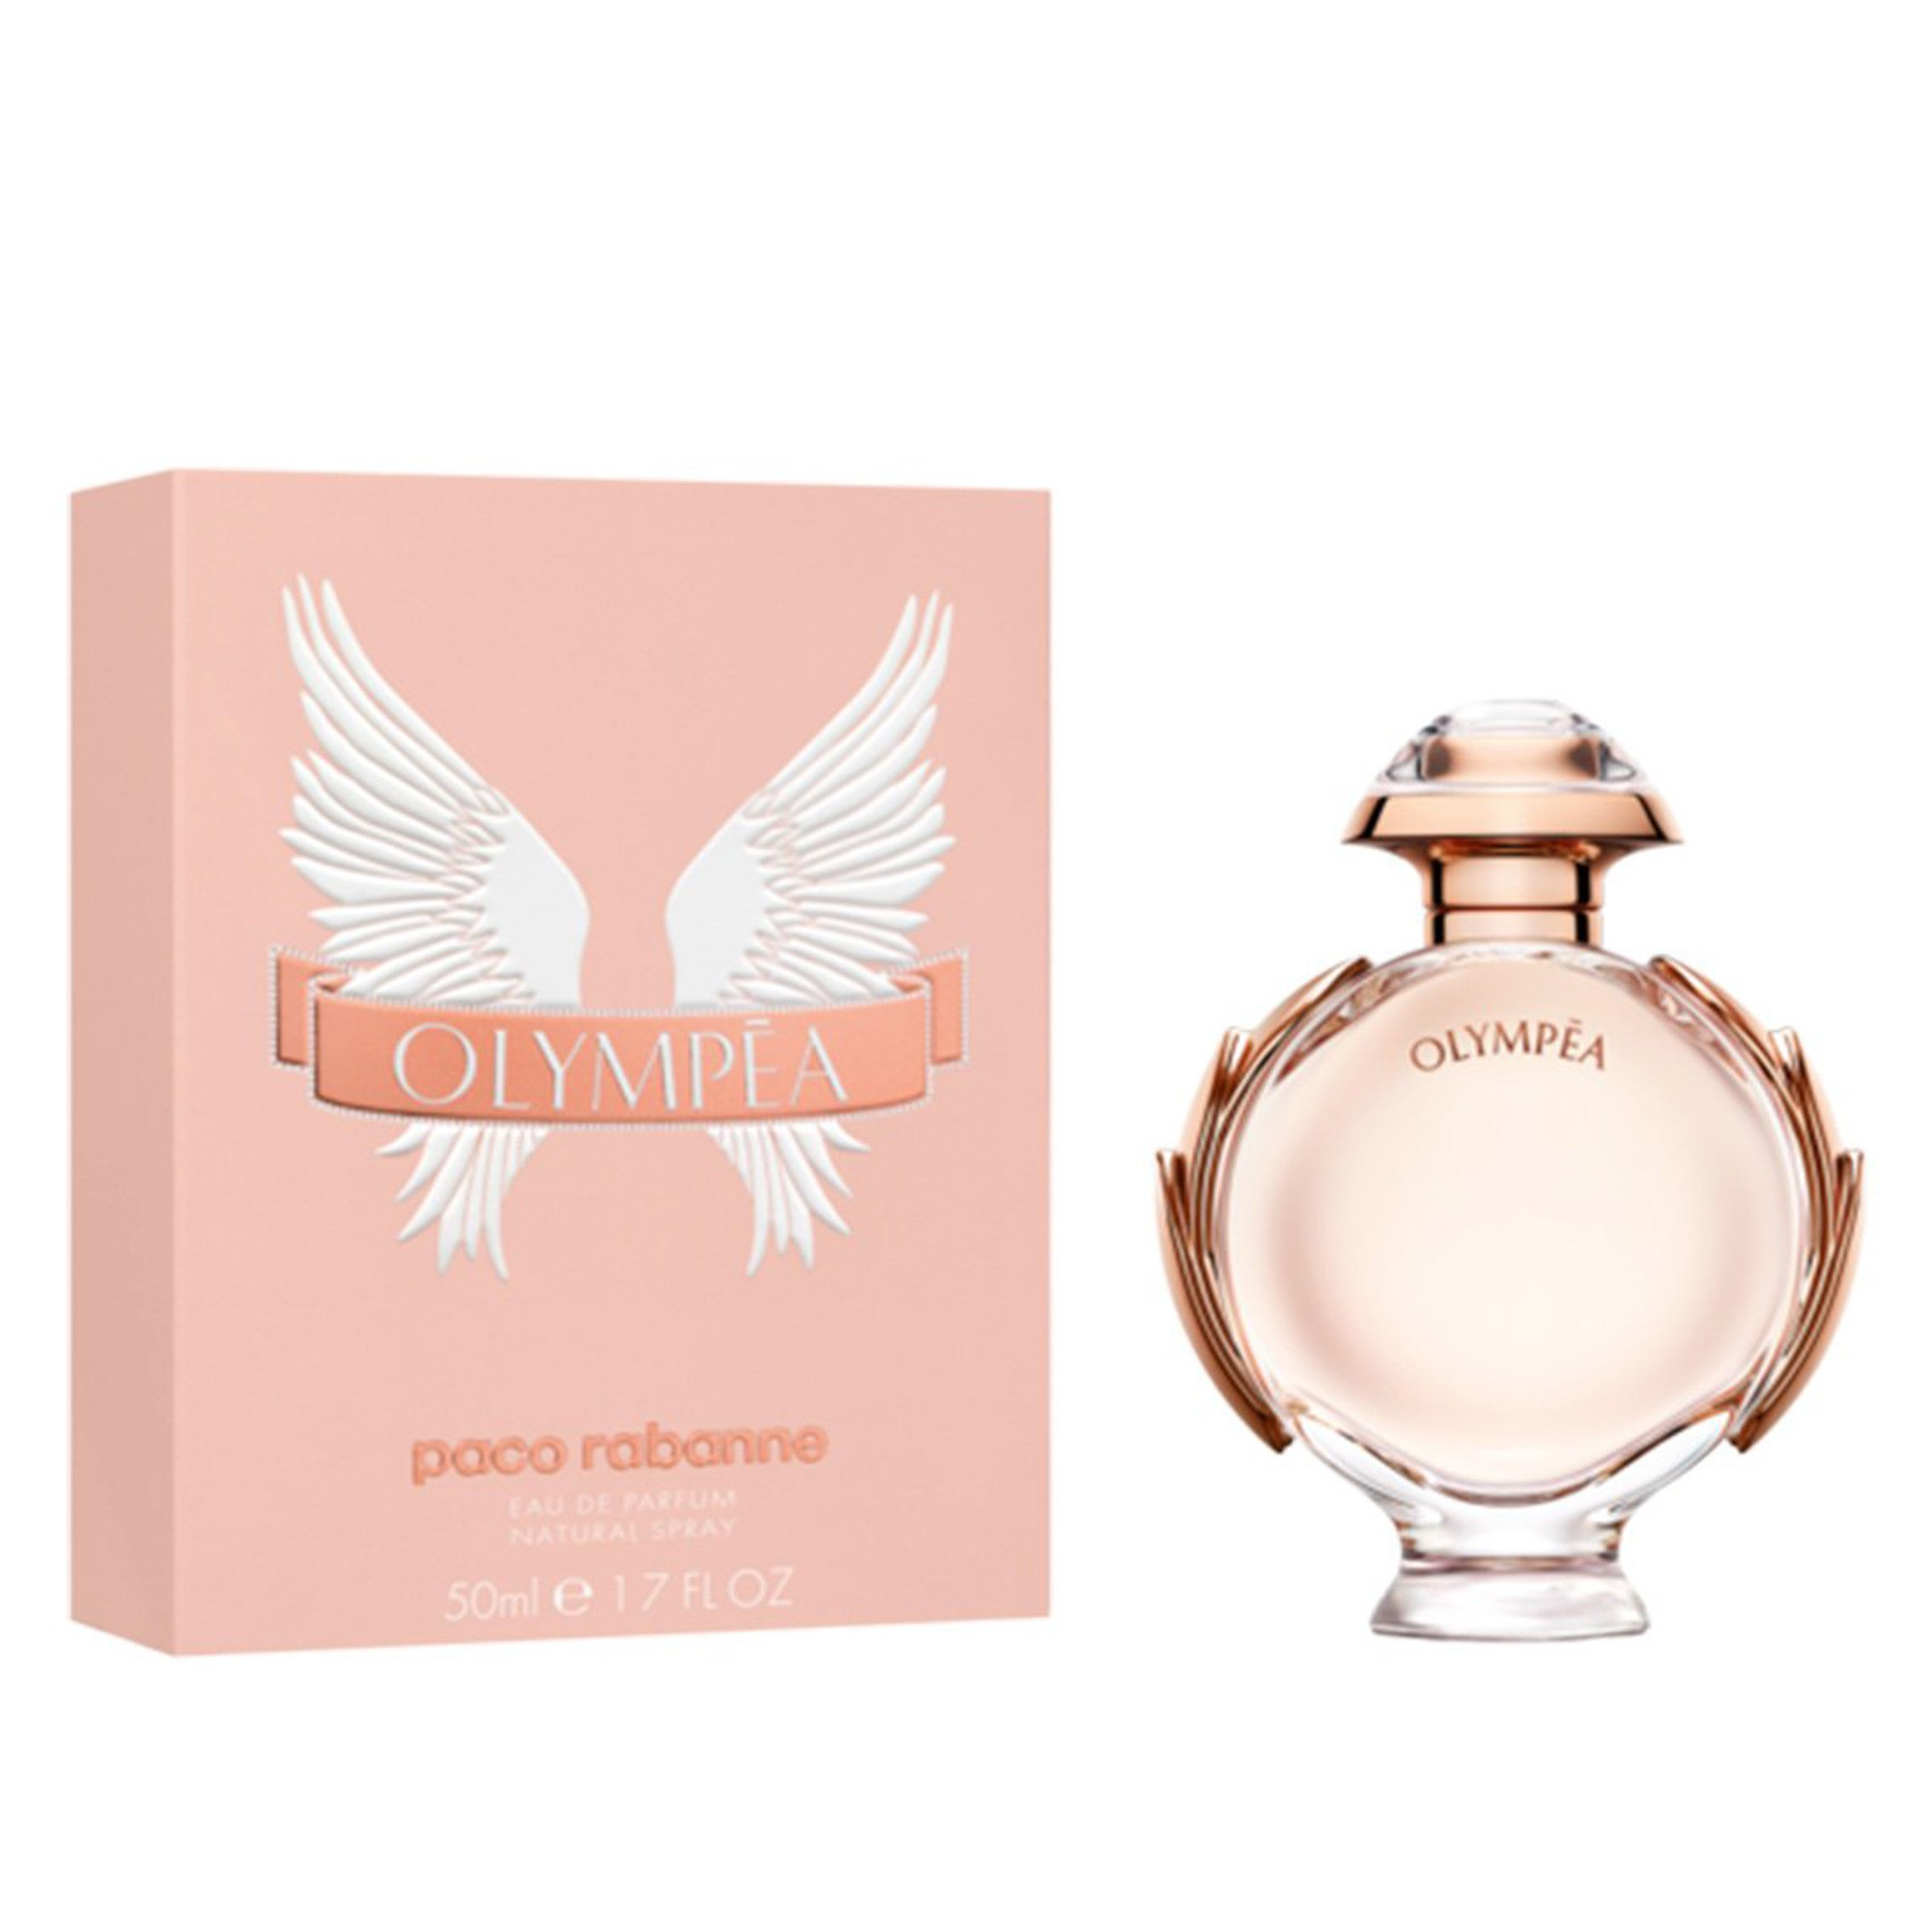 Olynpea Perfume 50ml